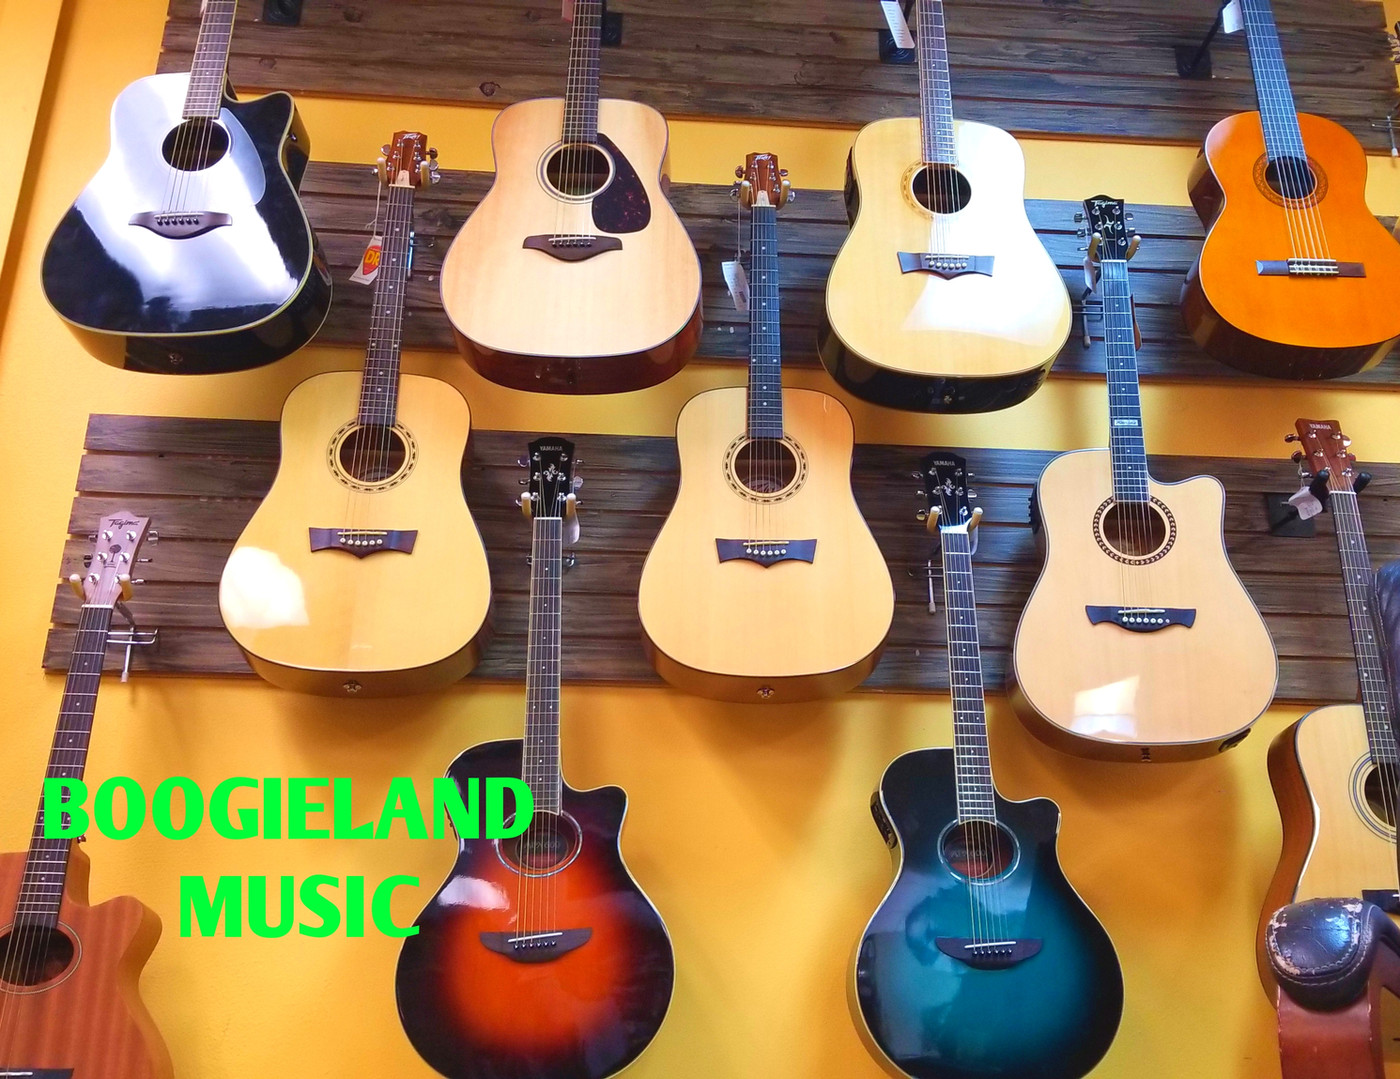 Boogieland Music